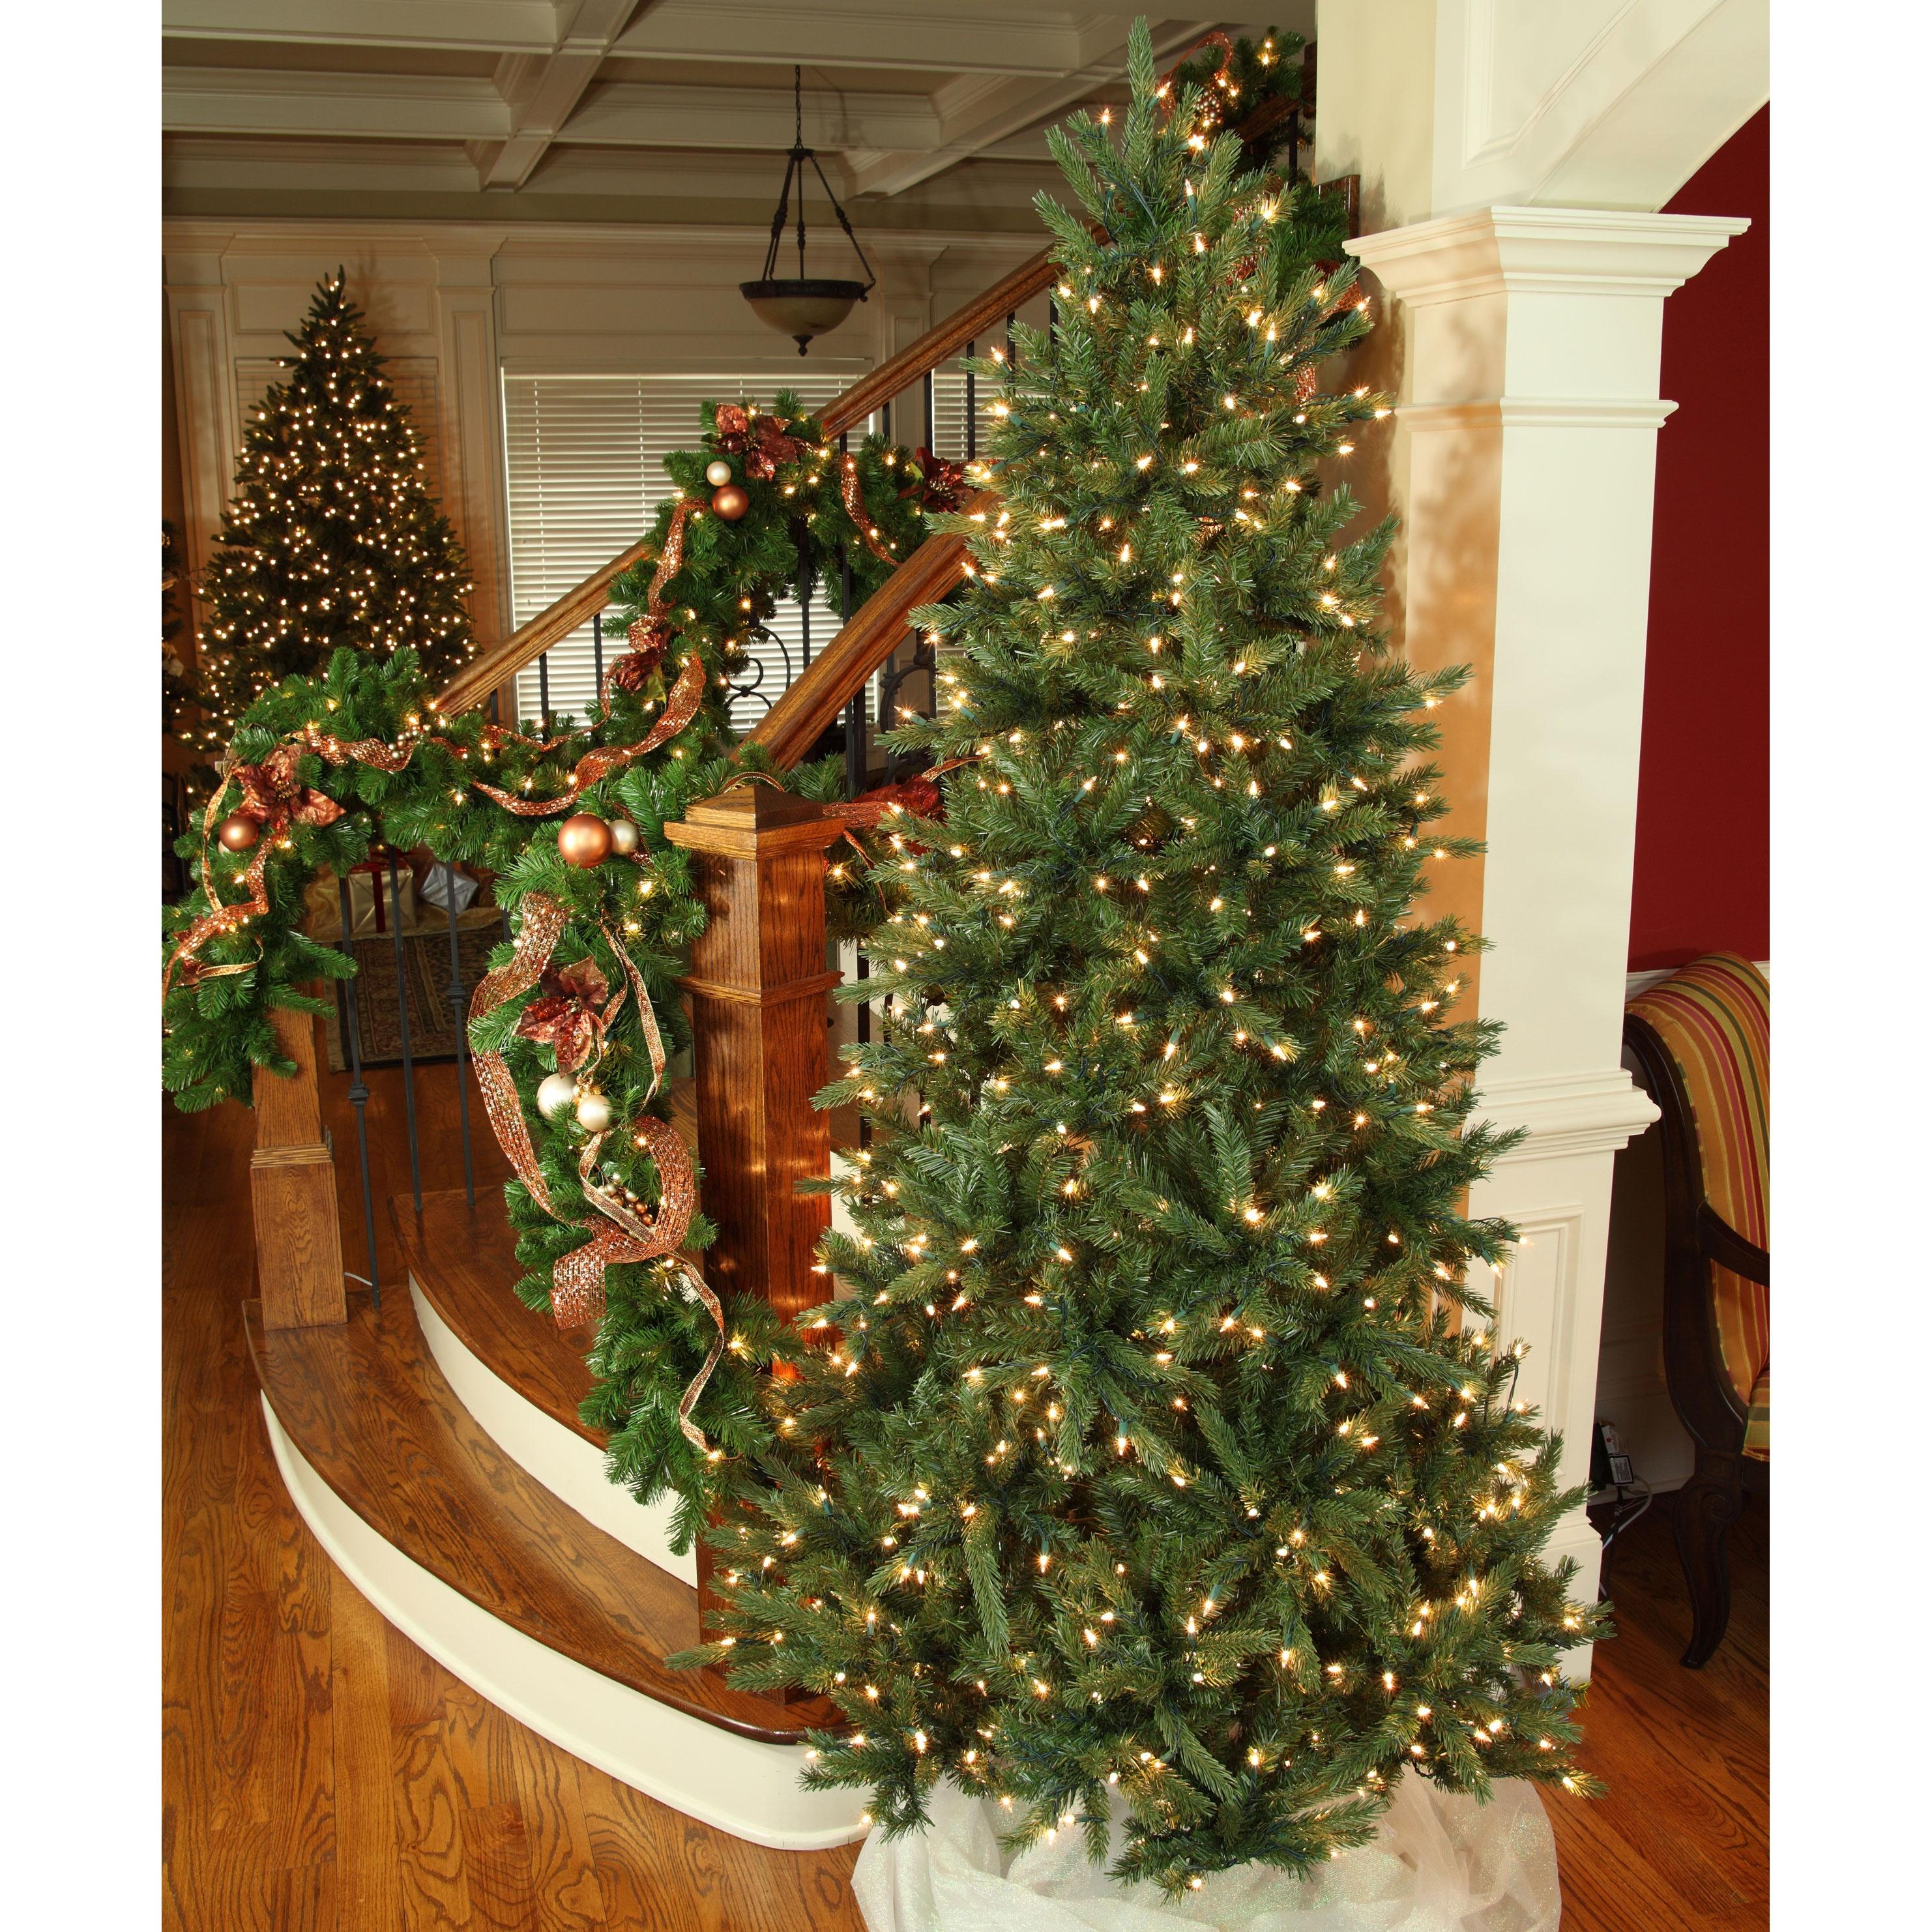 Balsam Fir Prelit Tree - Christmas Lights, Etc